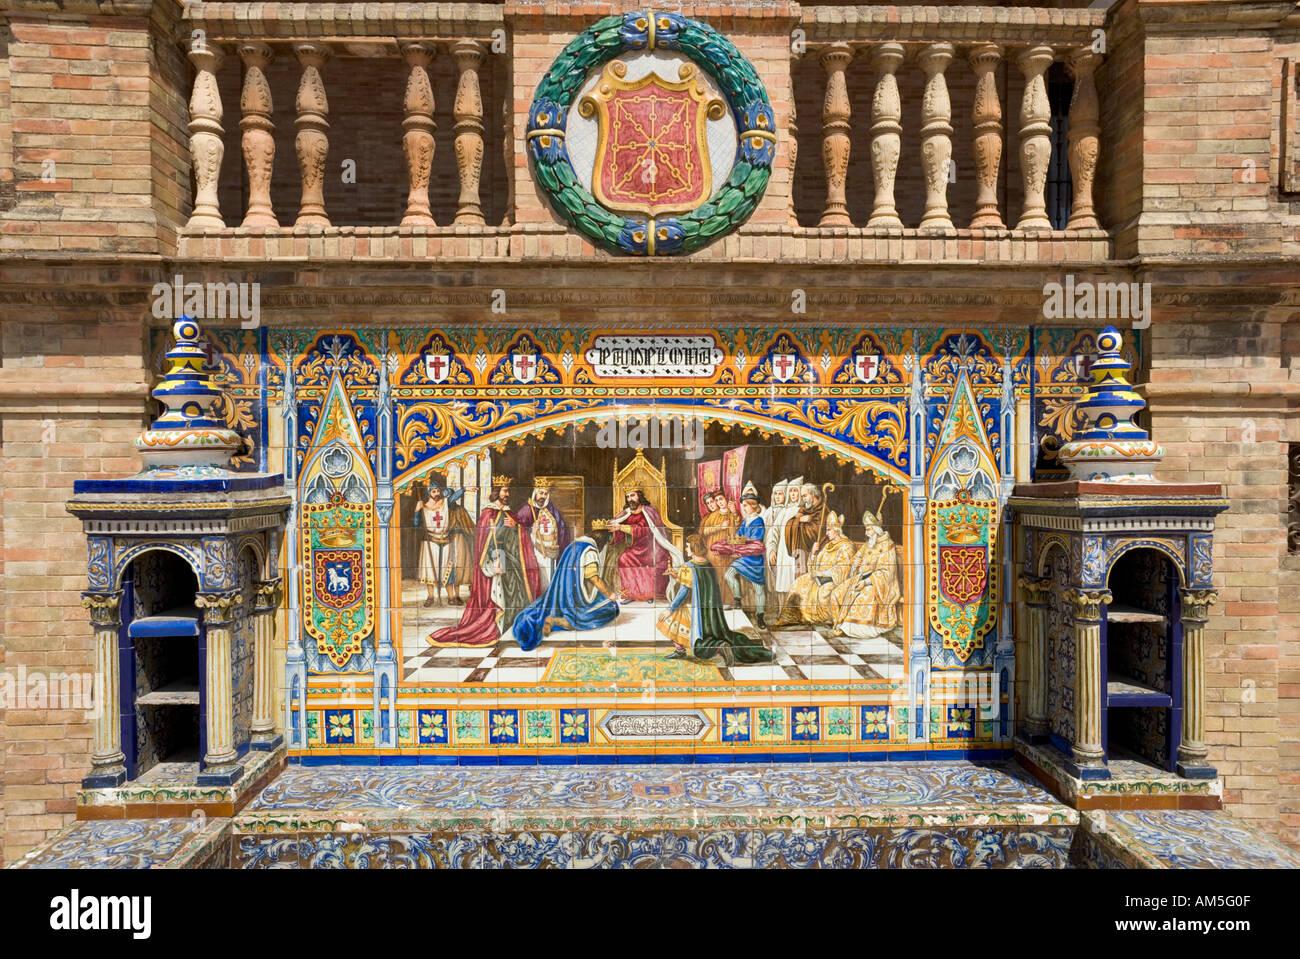 Tiled Mural of Pamplona, Plaza de Espana, Maria Luisa Park, Seville, Andalucia, Spain - Stock Image